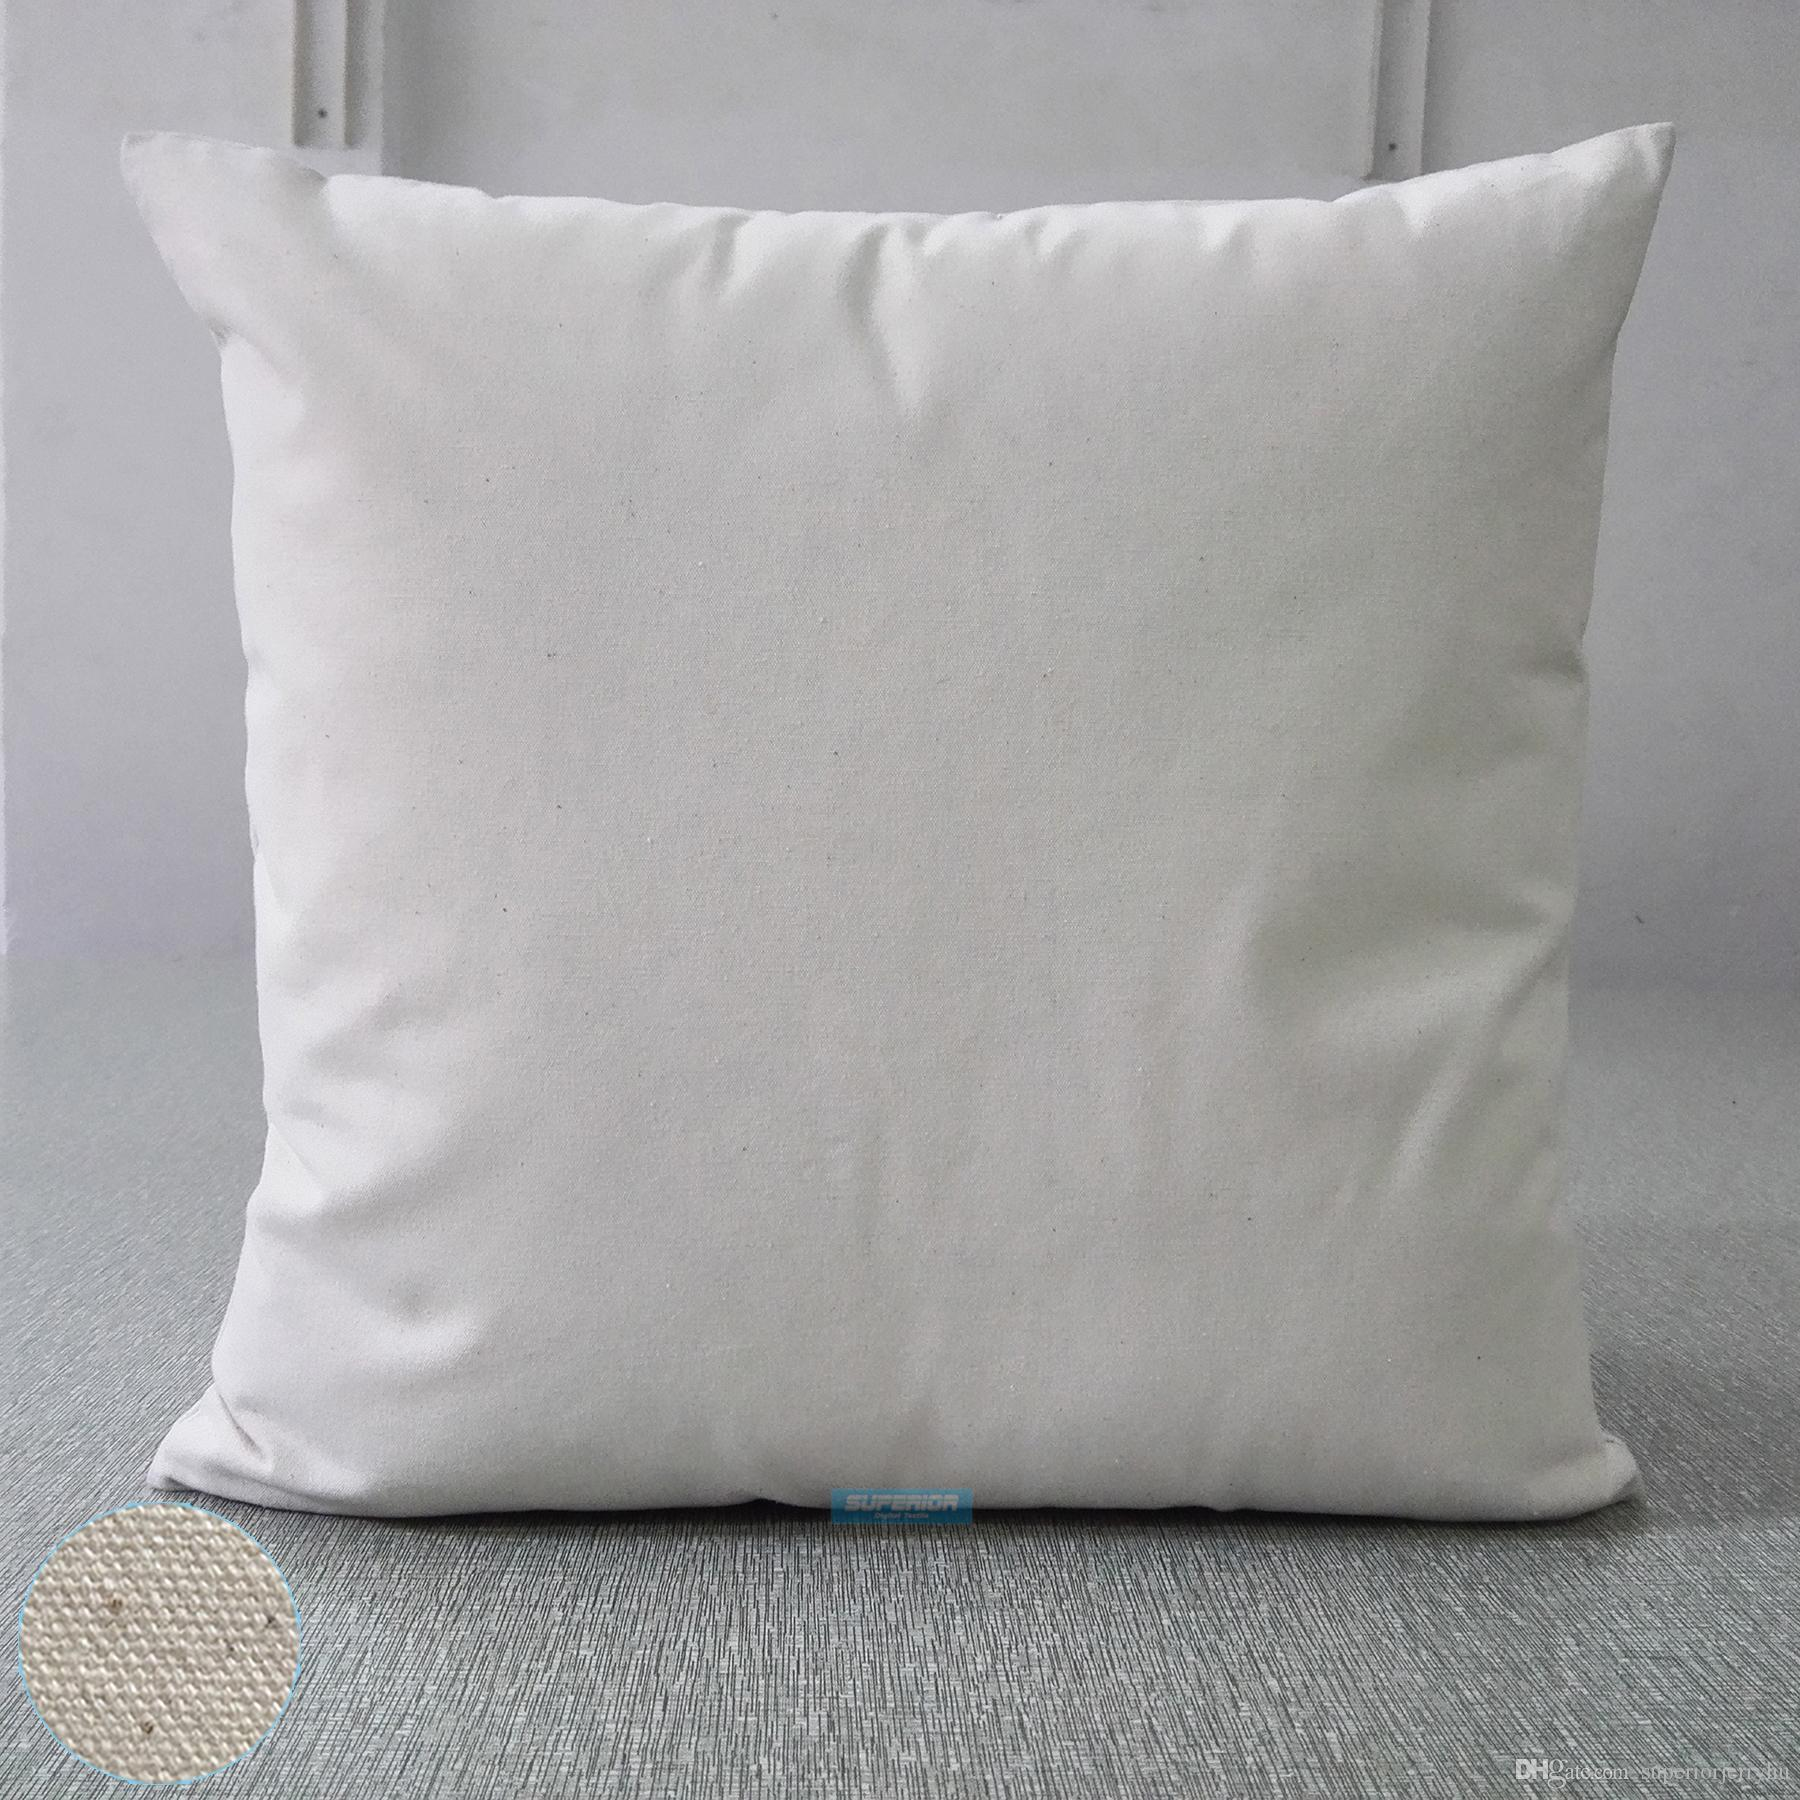 cheap 12x12 inches wholesale 8oz white